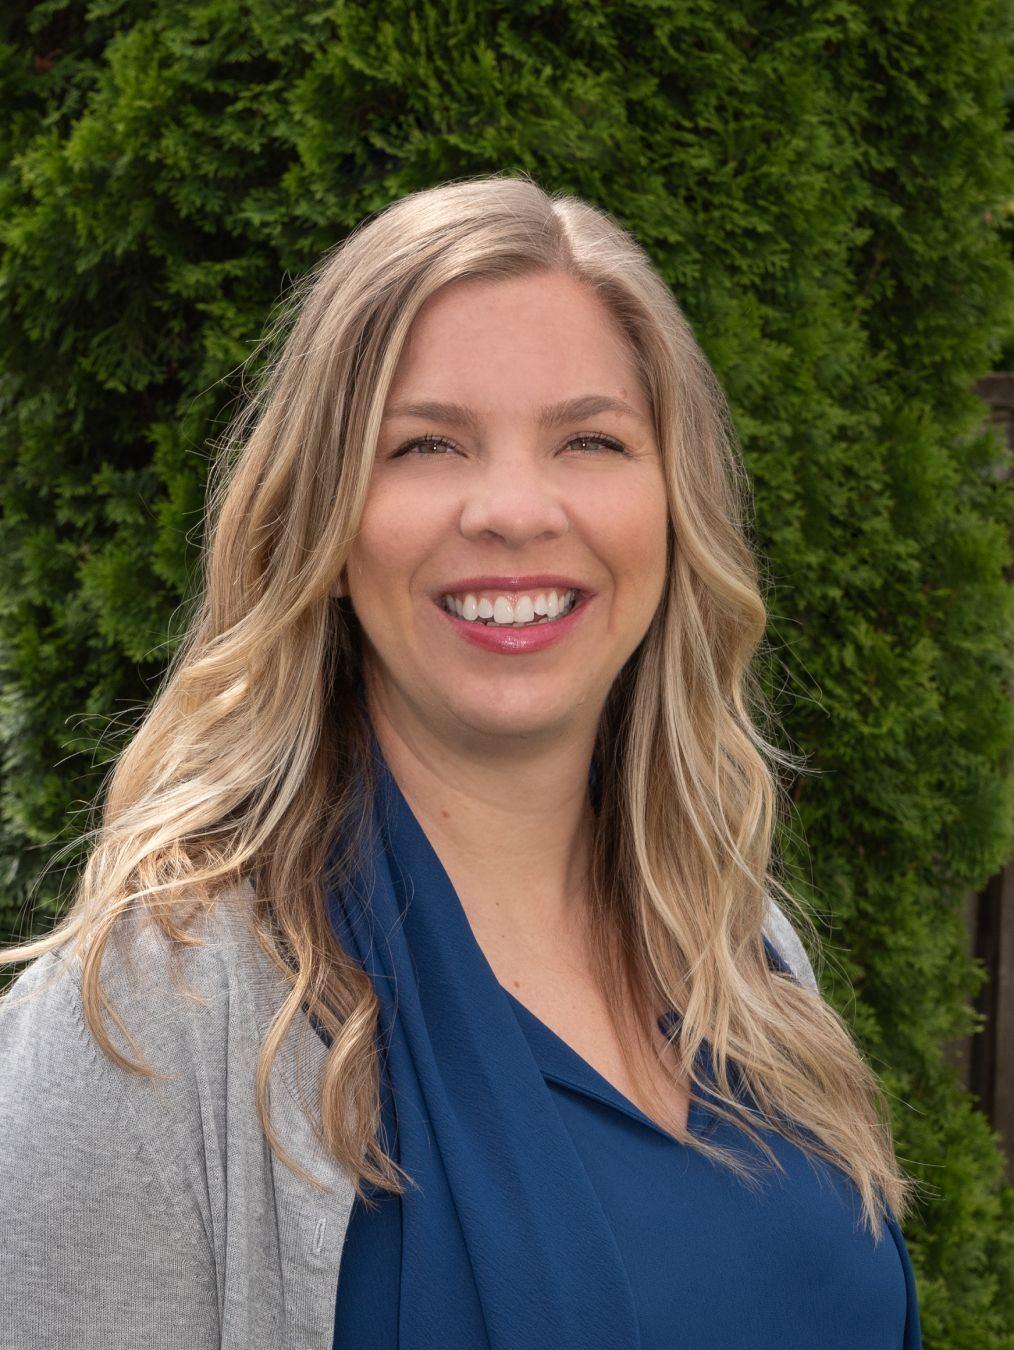 Heidi Lueb - Director of Finance & Accounting